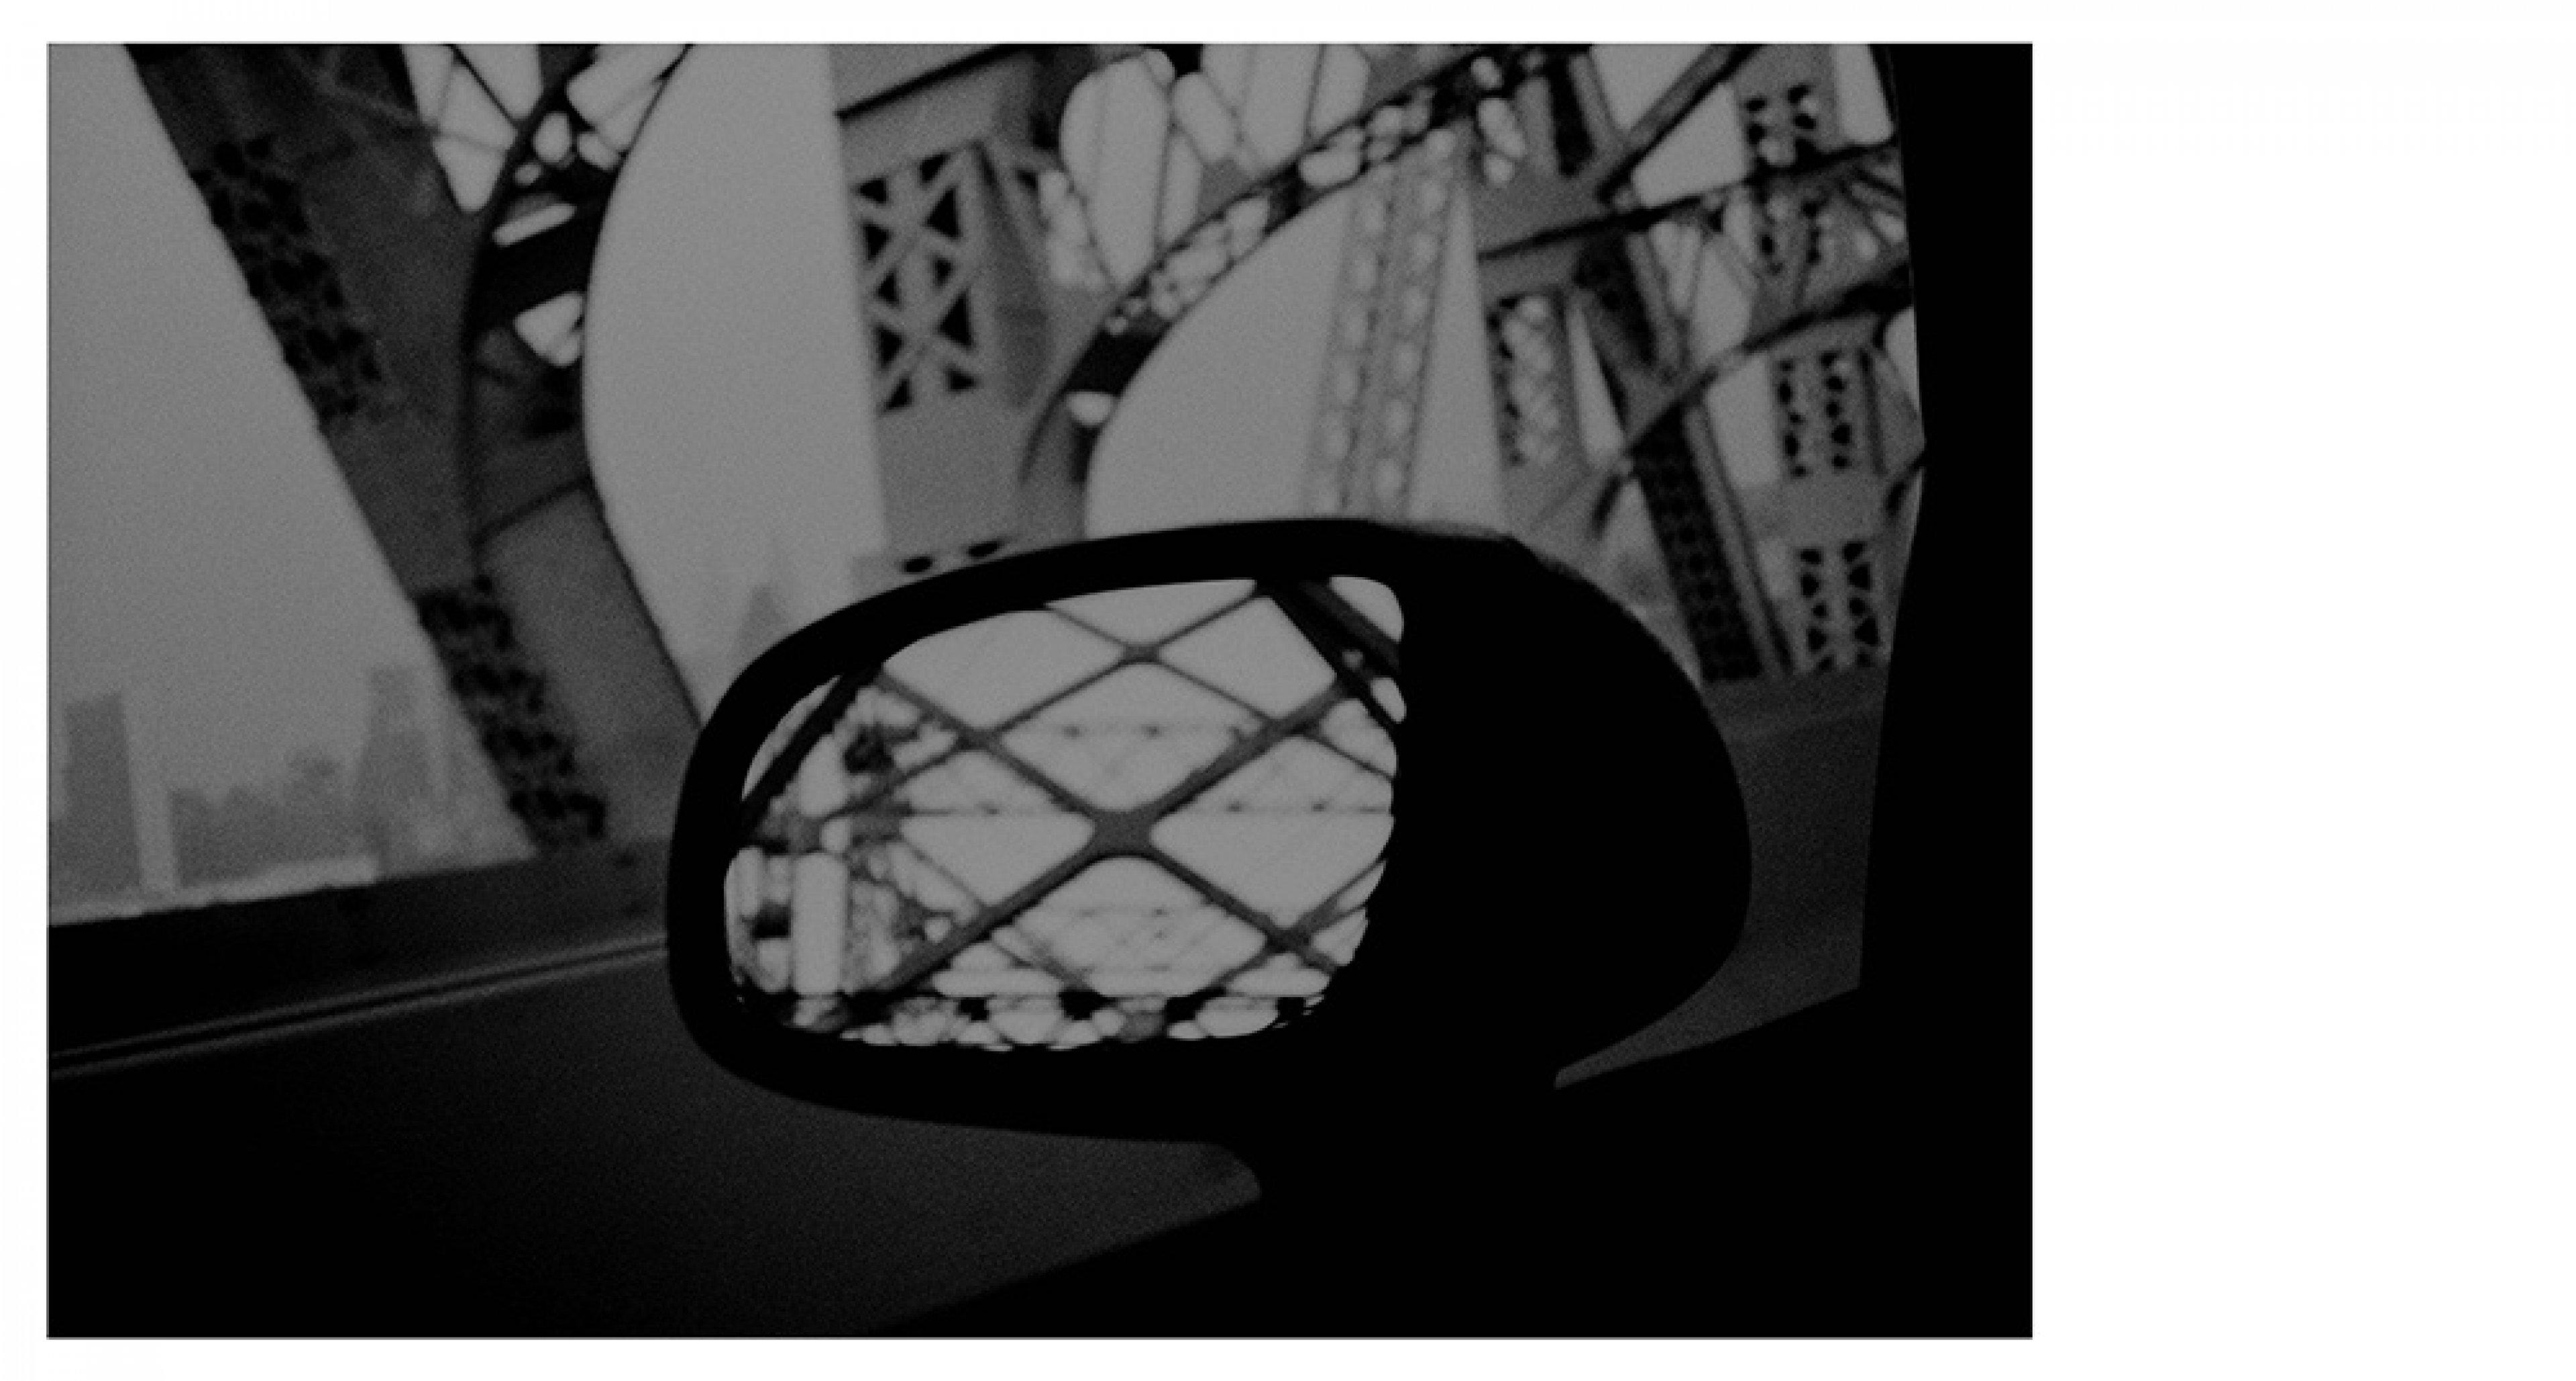 David Bradford, Coaster Ride Stealth, 1994 From Drive-By Shootings series C-print, 28 × 35.5 cm Courtesy of the artist © David Bradford